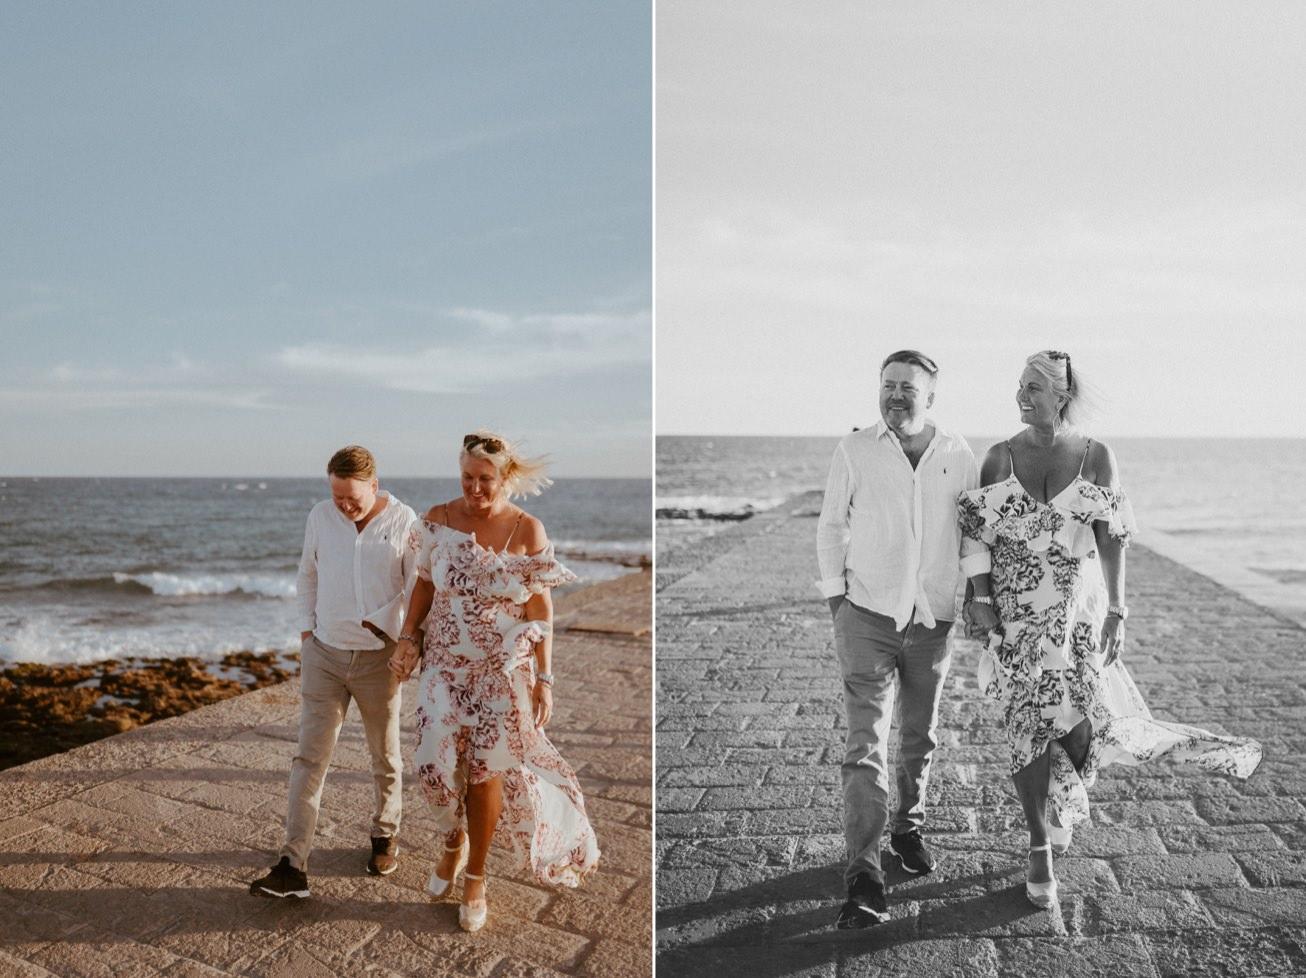 Gran Canaria Maspalomas Canaria Canaries Wedding Family Photographer 17